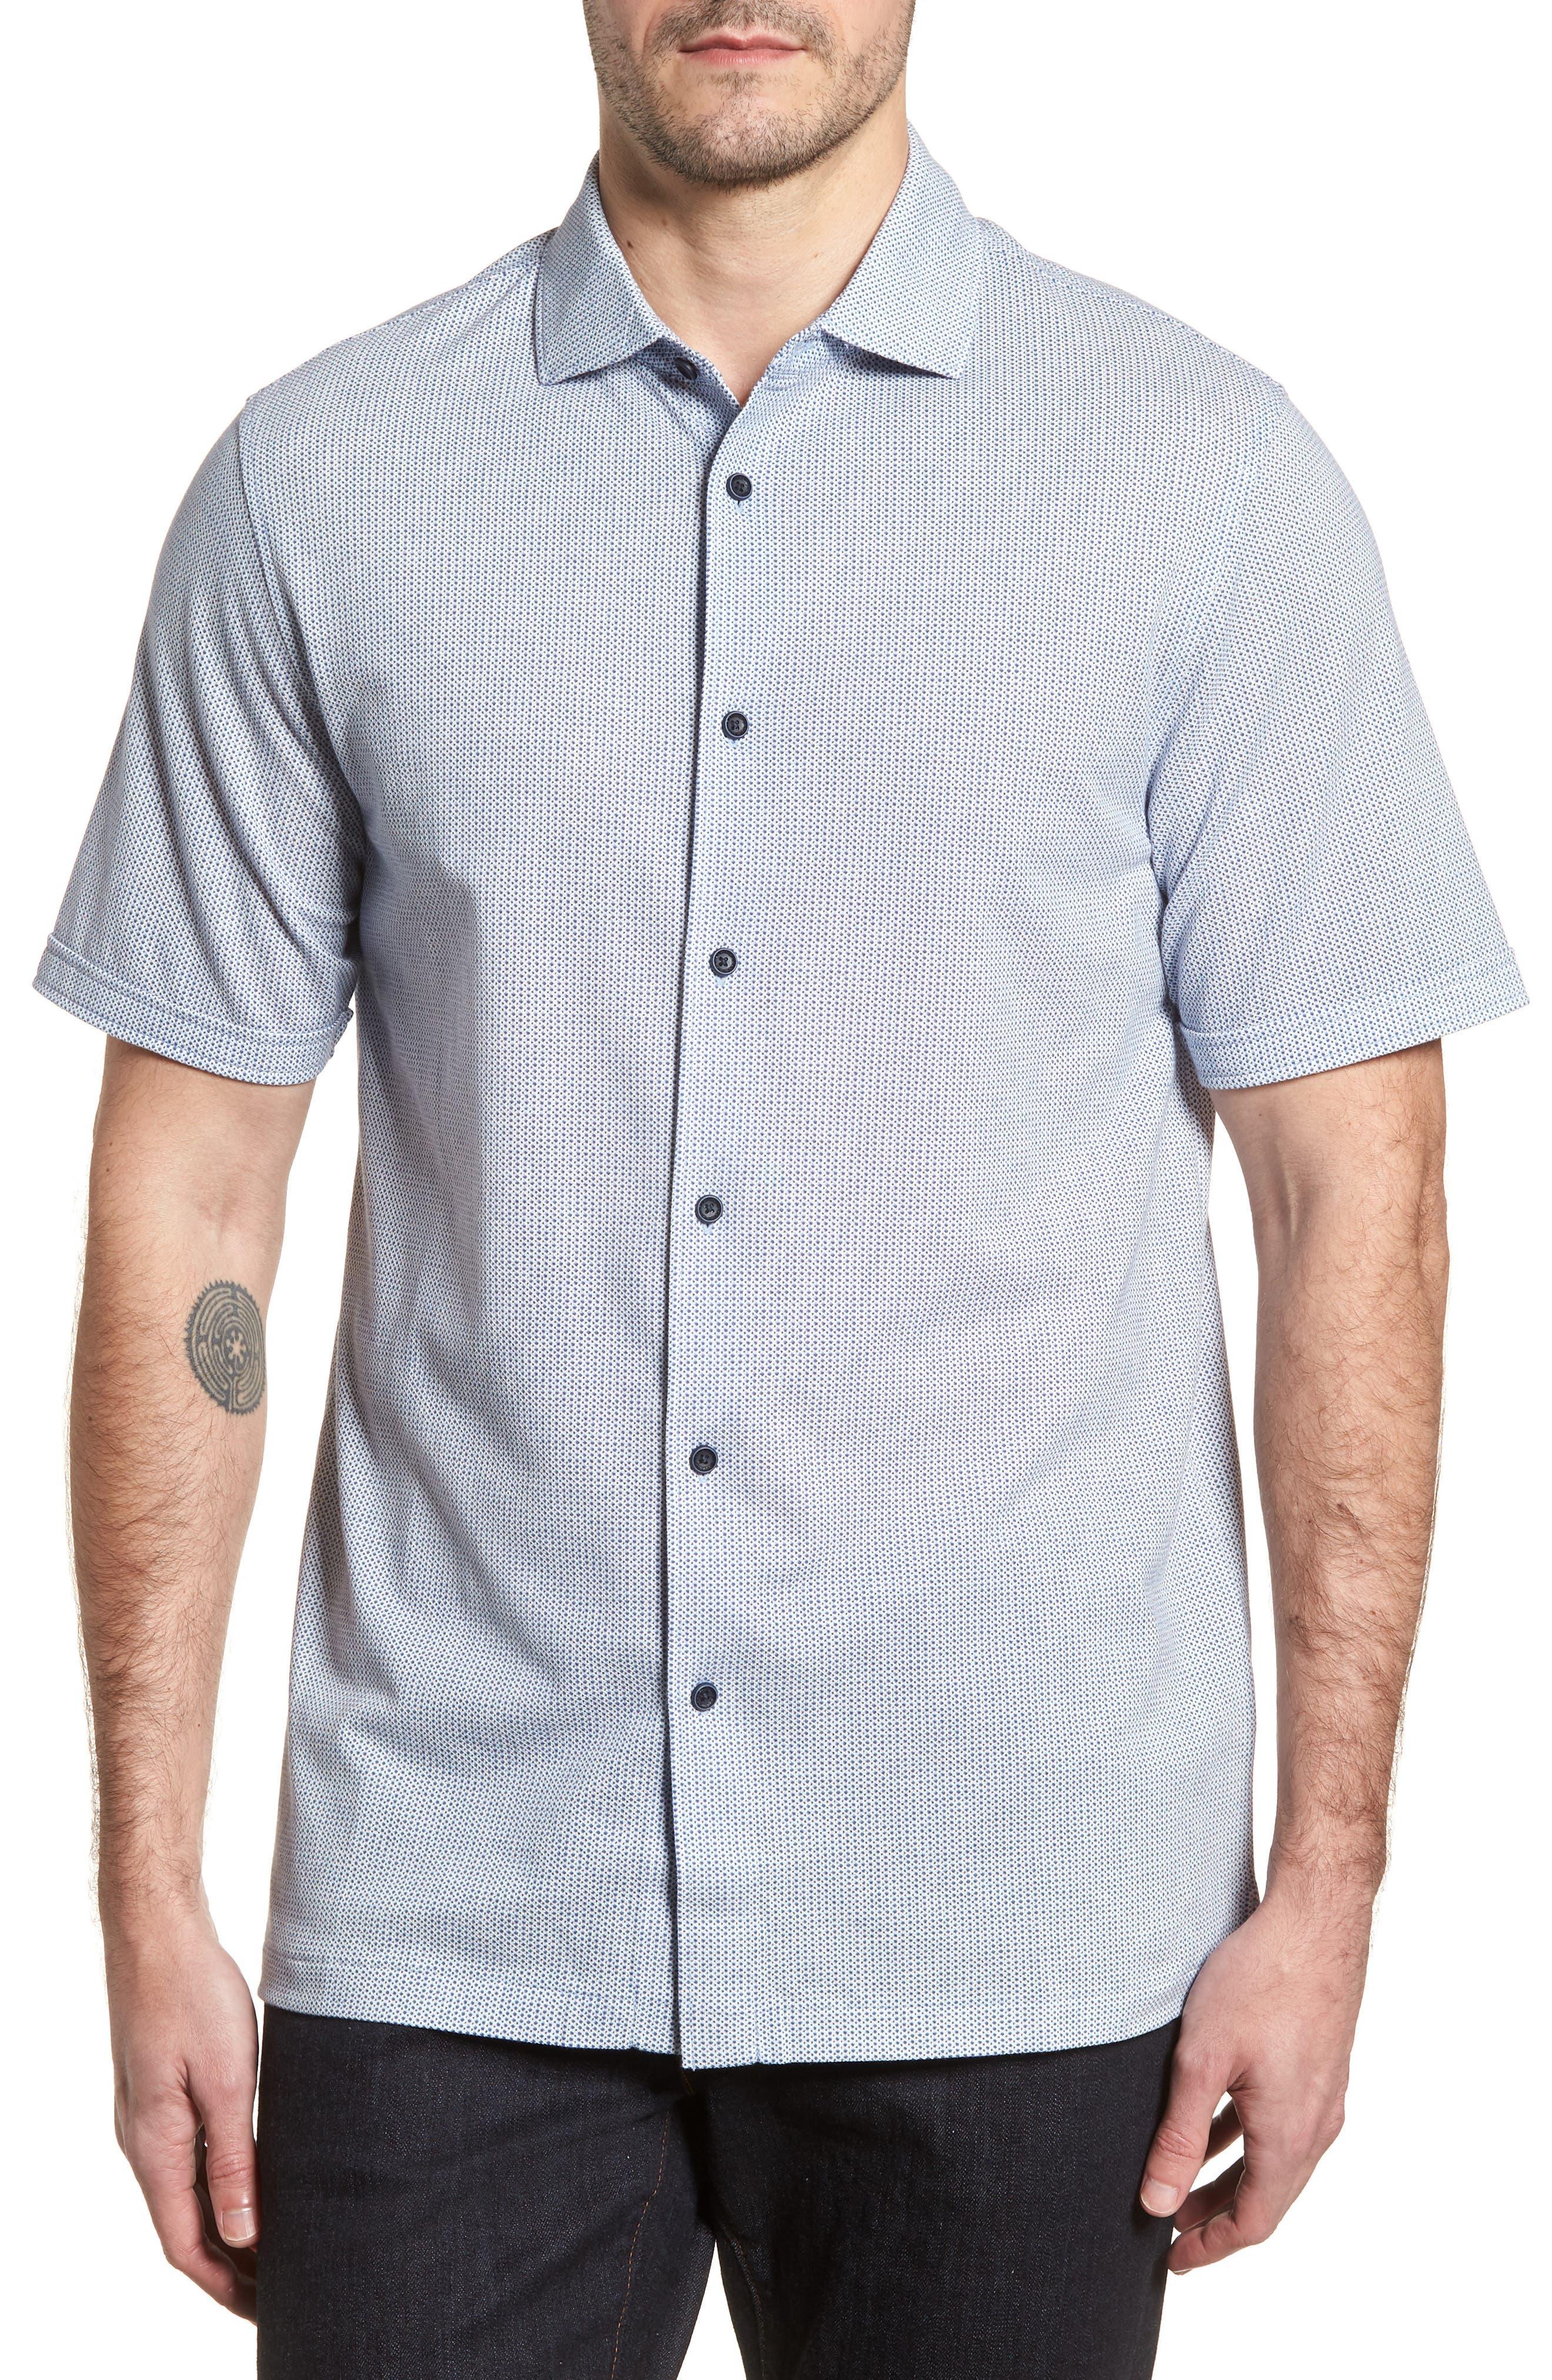 BUGATCHI,                             Shaped Fit Microprint Sport Shirt,                             Main thumbnail 1, color,                             CLASSIC BLUE